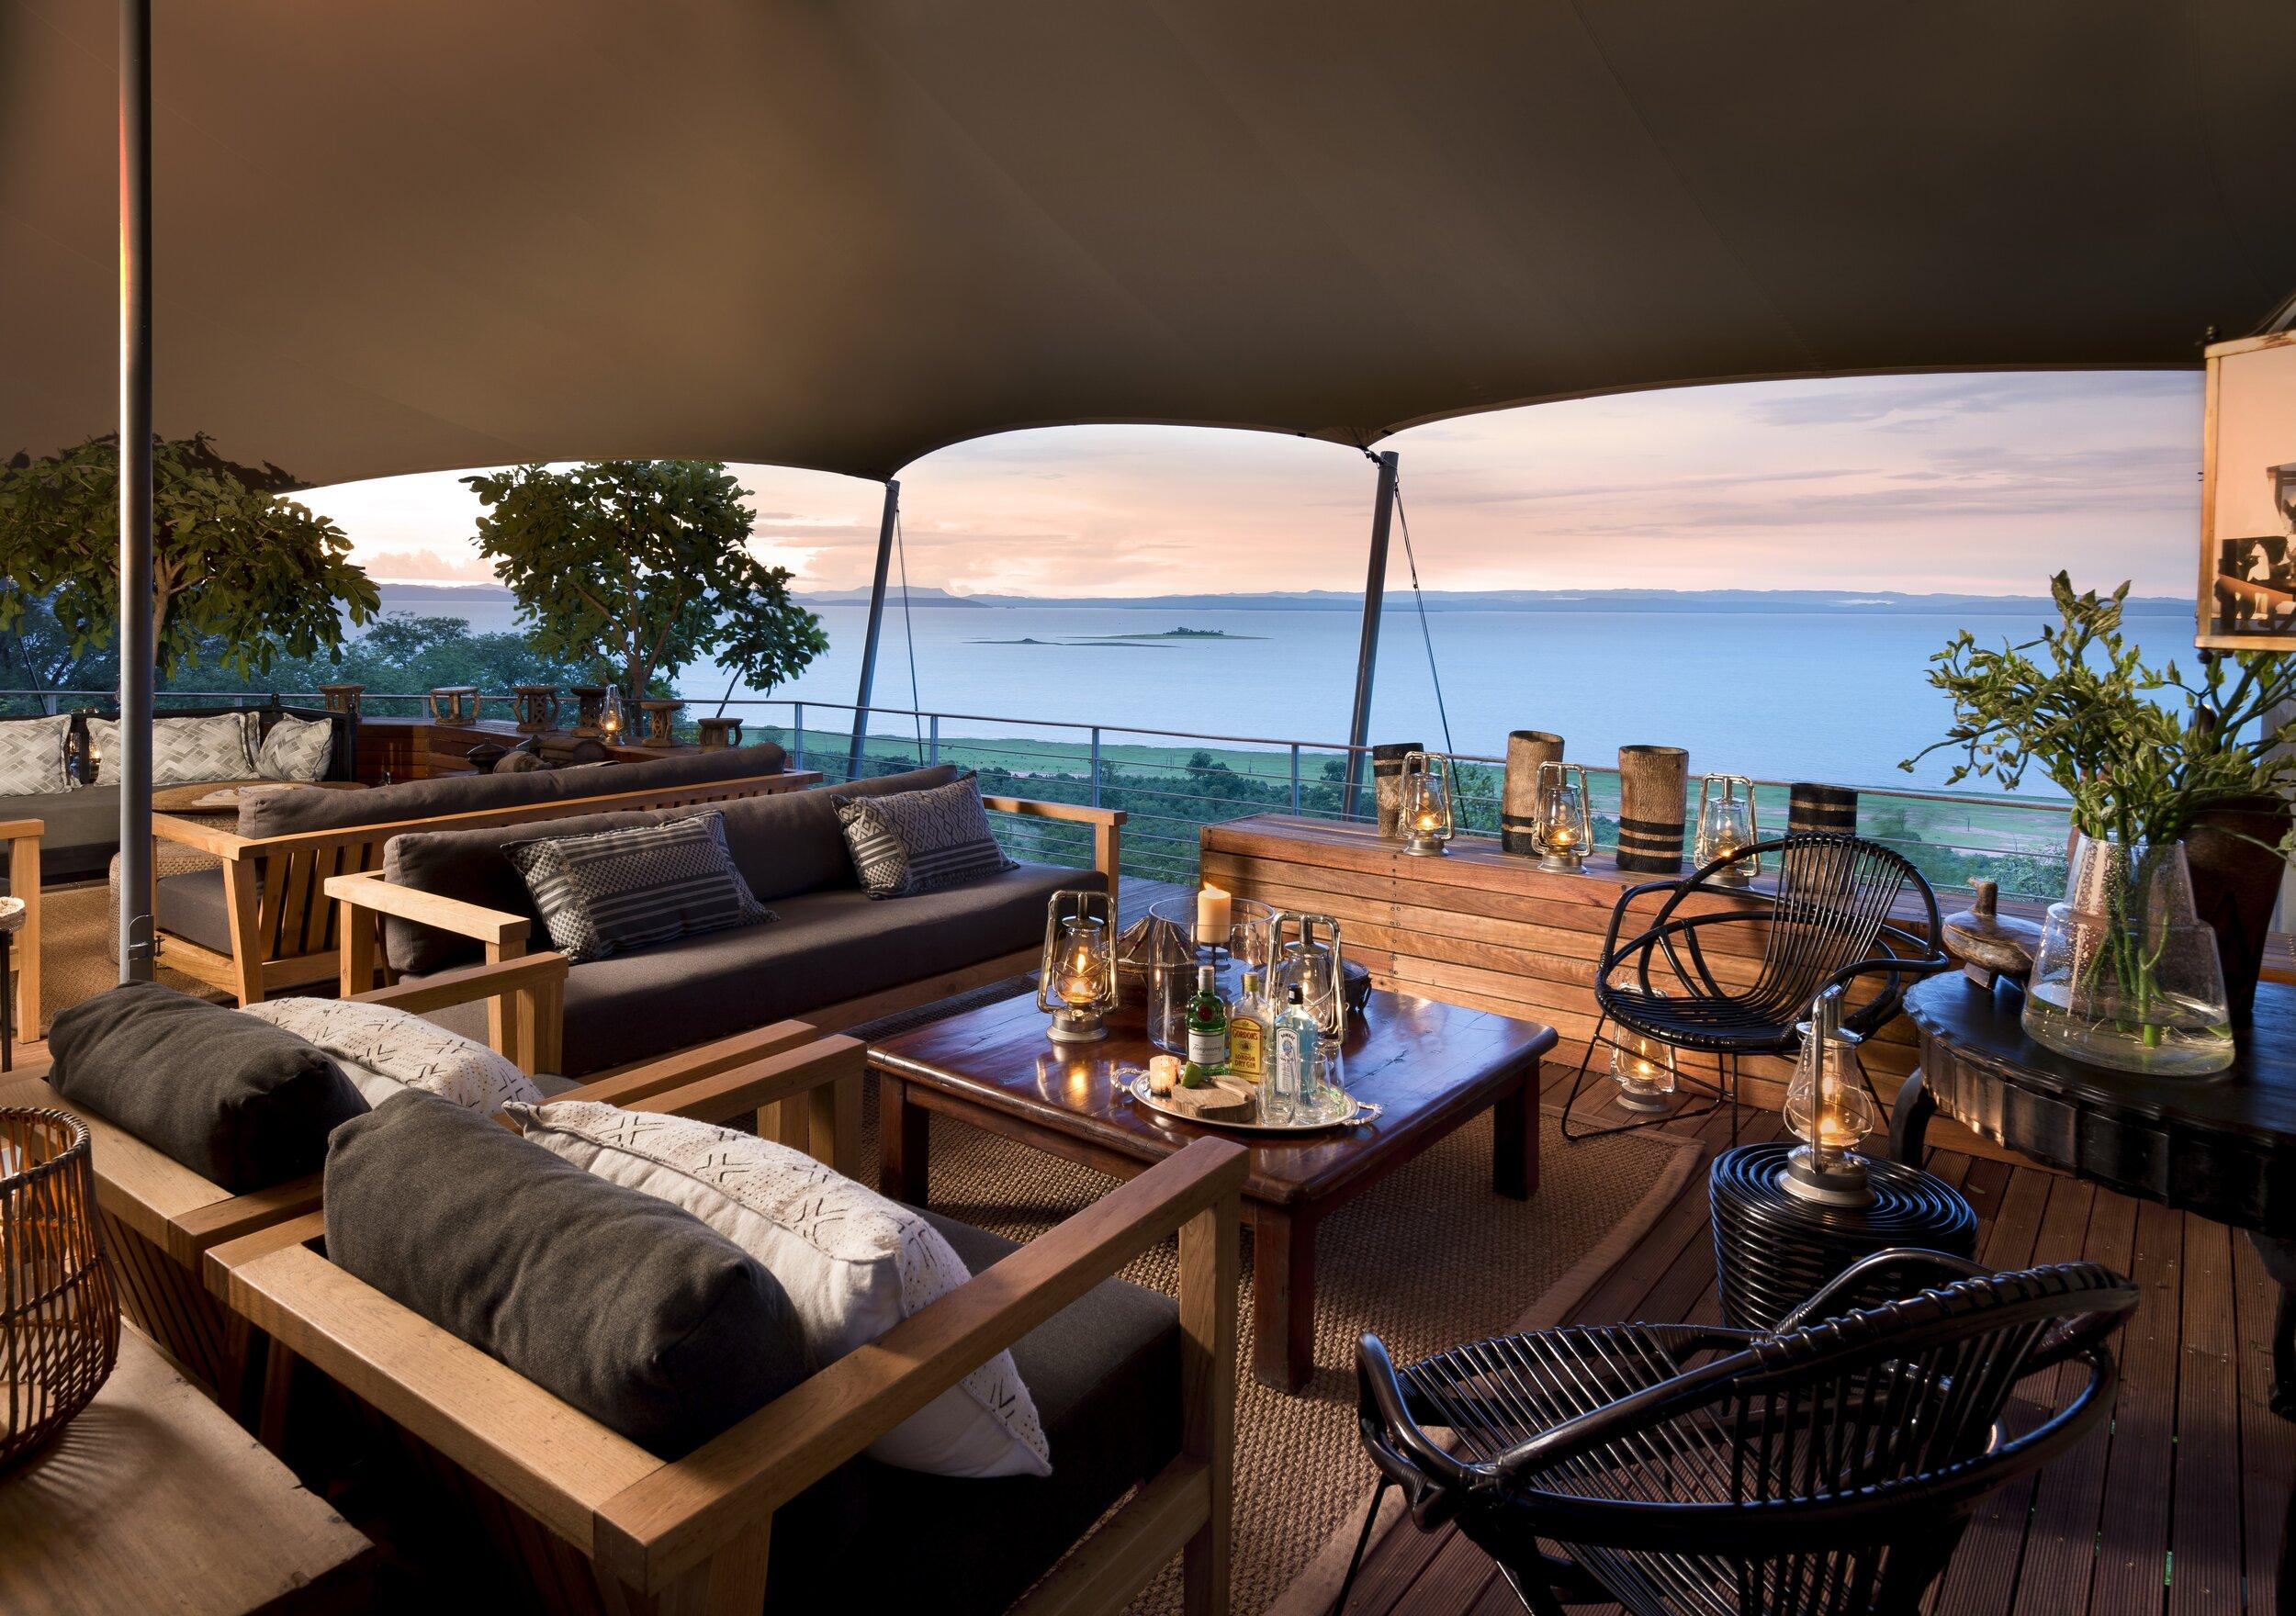 bumi_hills_safari_lodge_lake_kariba_zimbabwe_luxury_safari_lodge__kingfisher_cottage_double_suite_living_room_lake_view_african_bush_camps_32.jpg